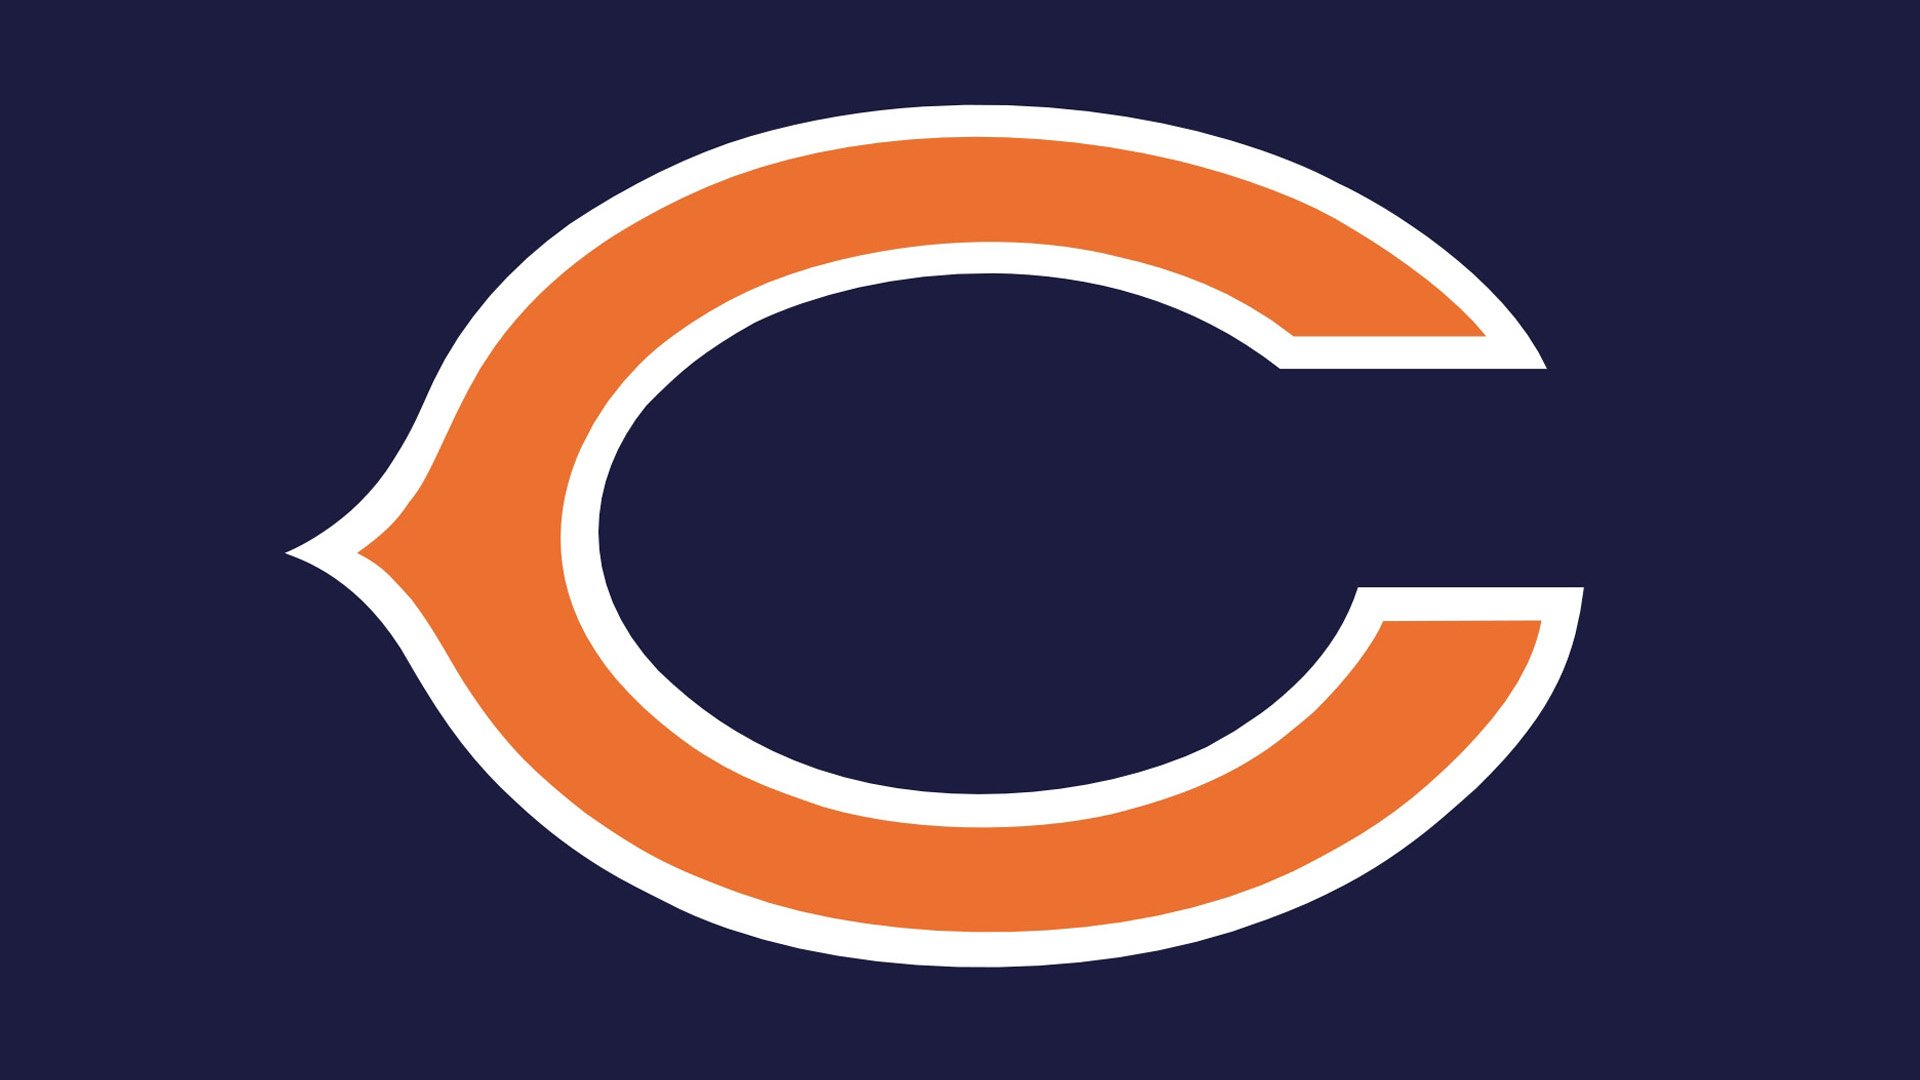 Chicago Bears wallpaper 104149 1920x1080